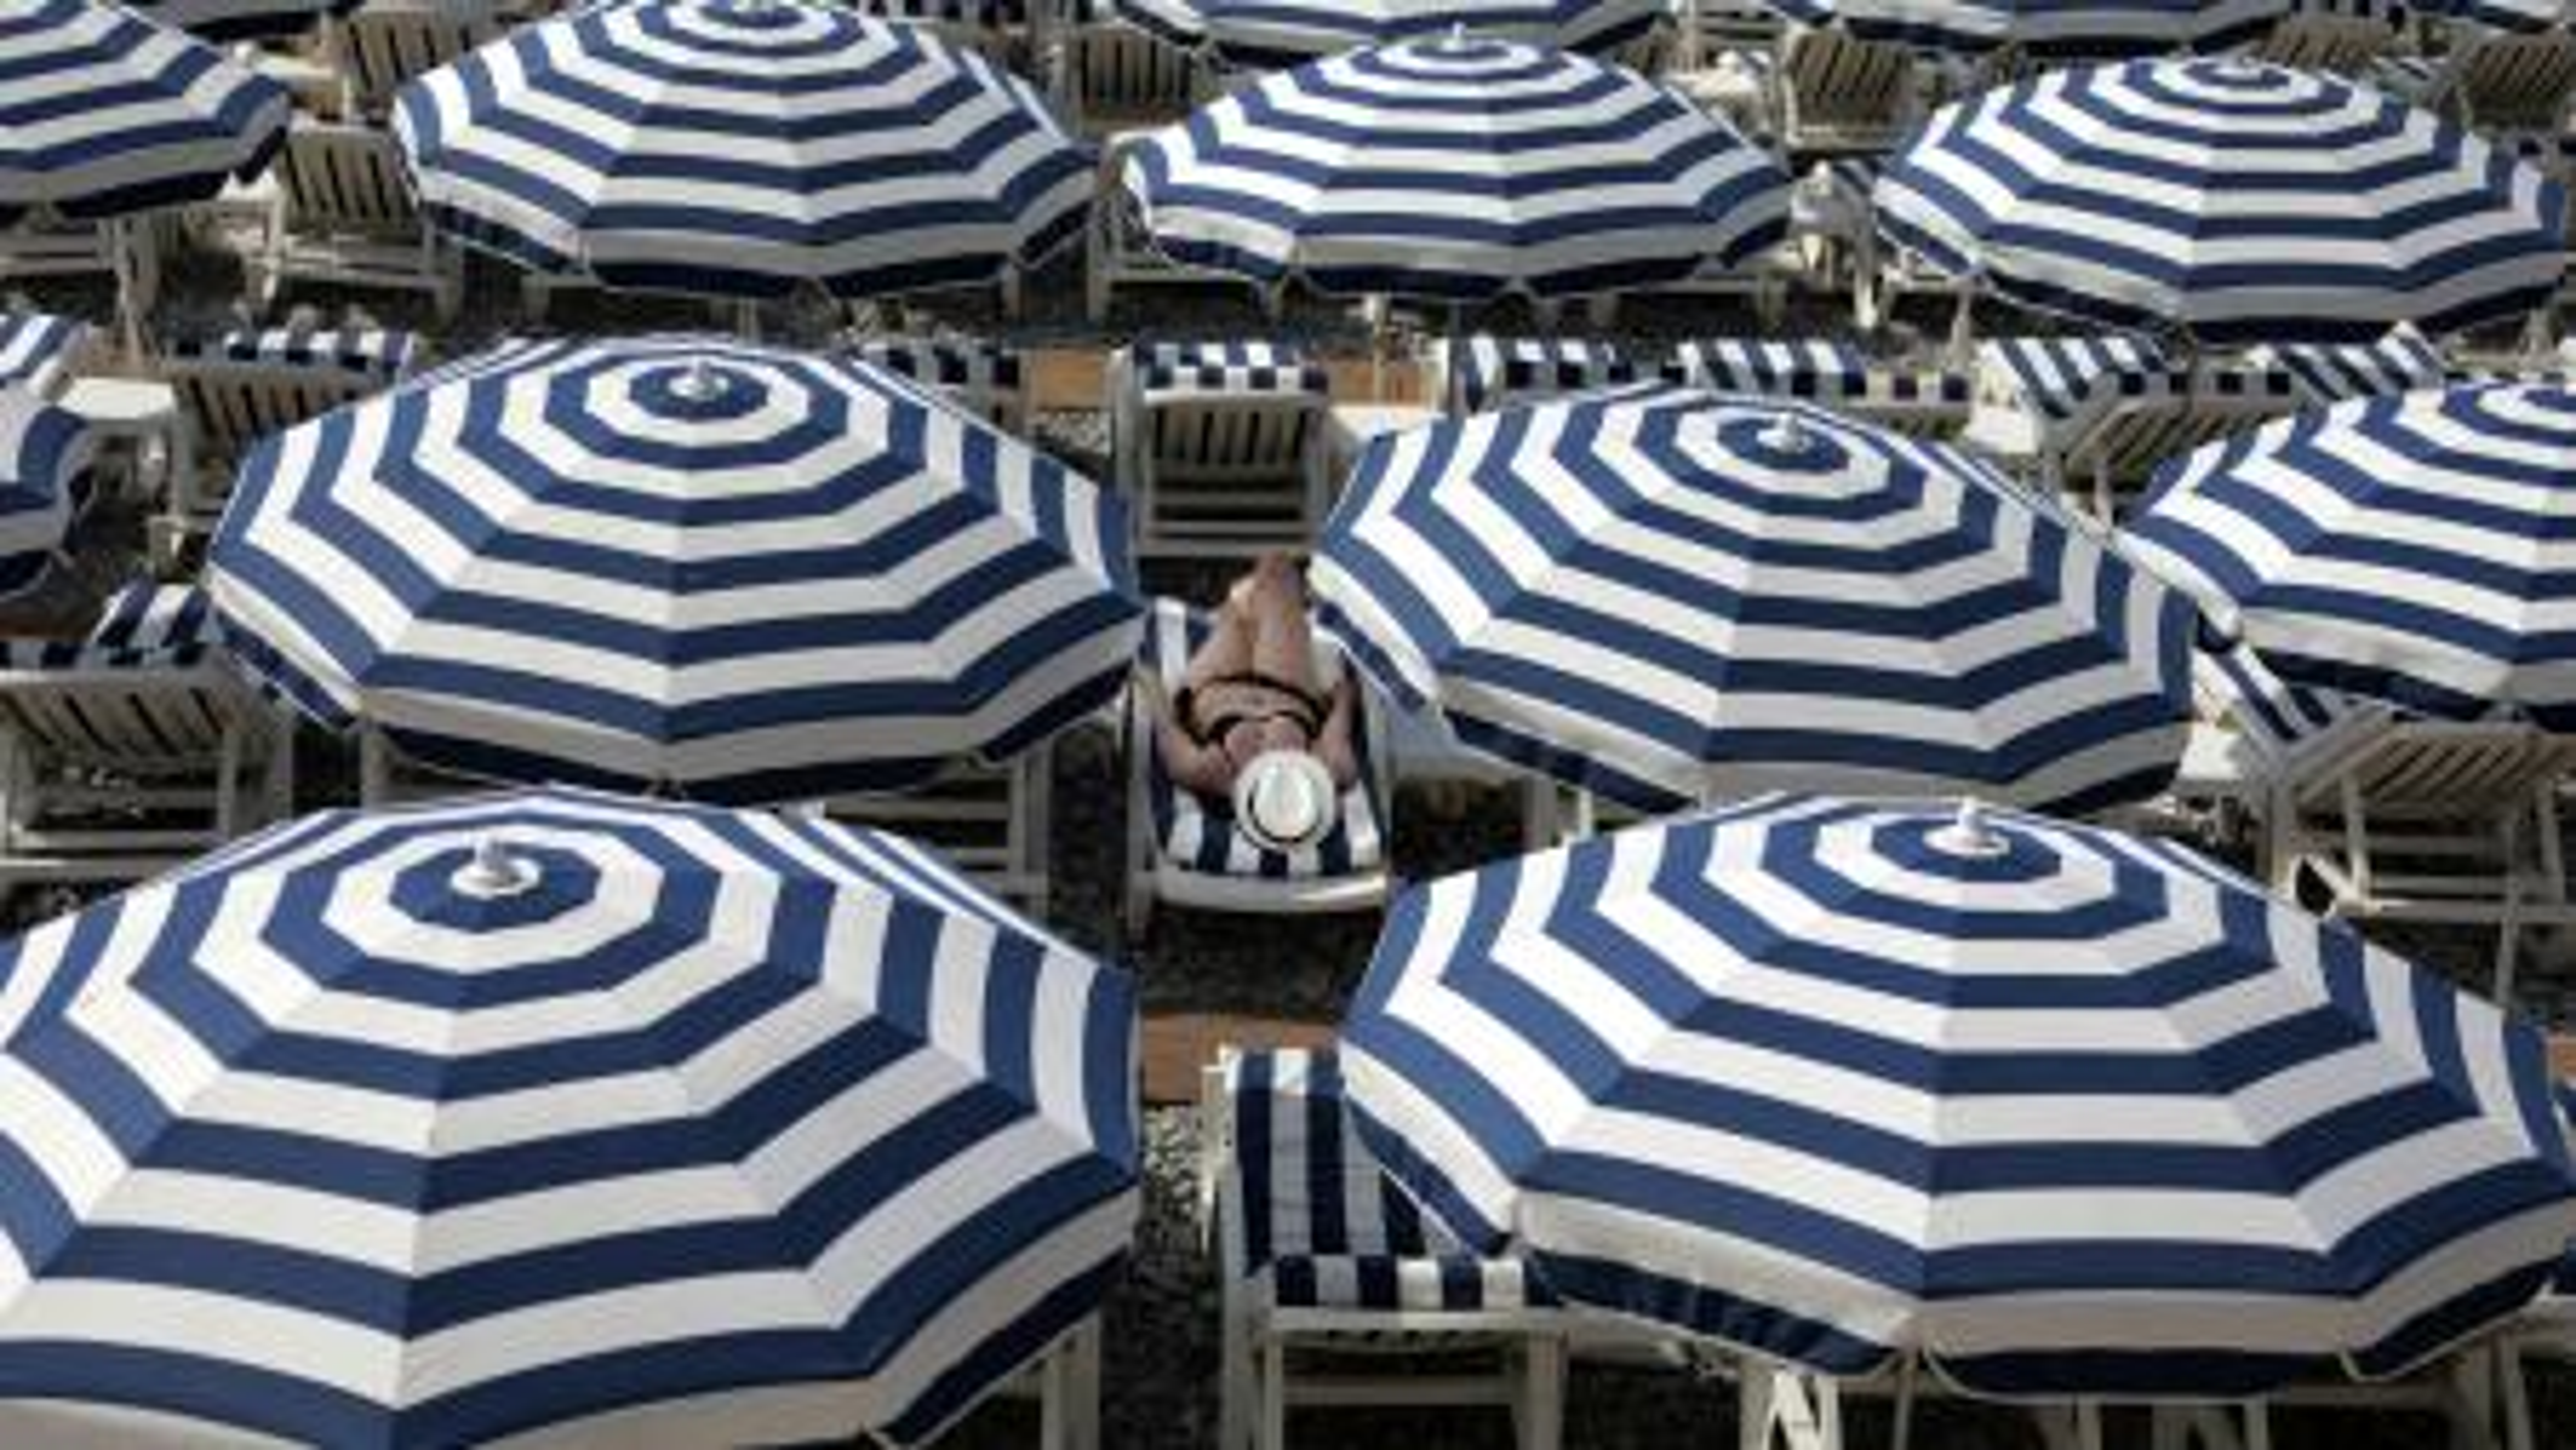 People sitting under umbrellas on the beach.